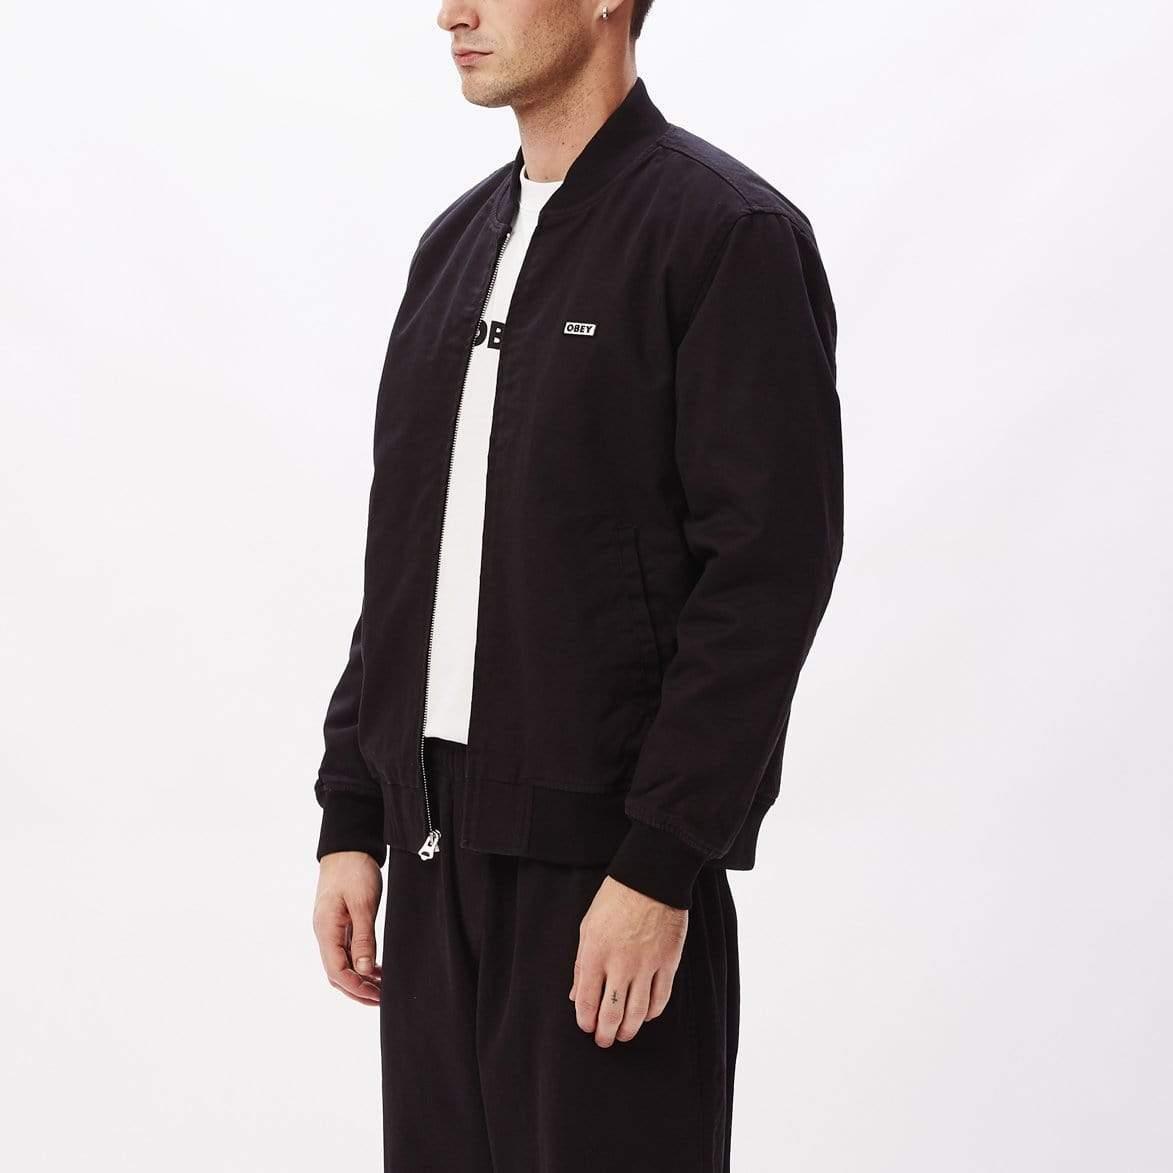 giacche obey east bomber jacket black blakshop 18293445722265.progressive